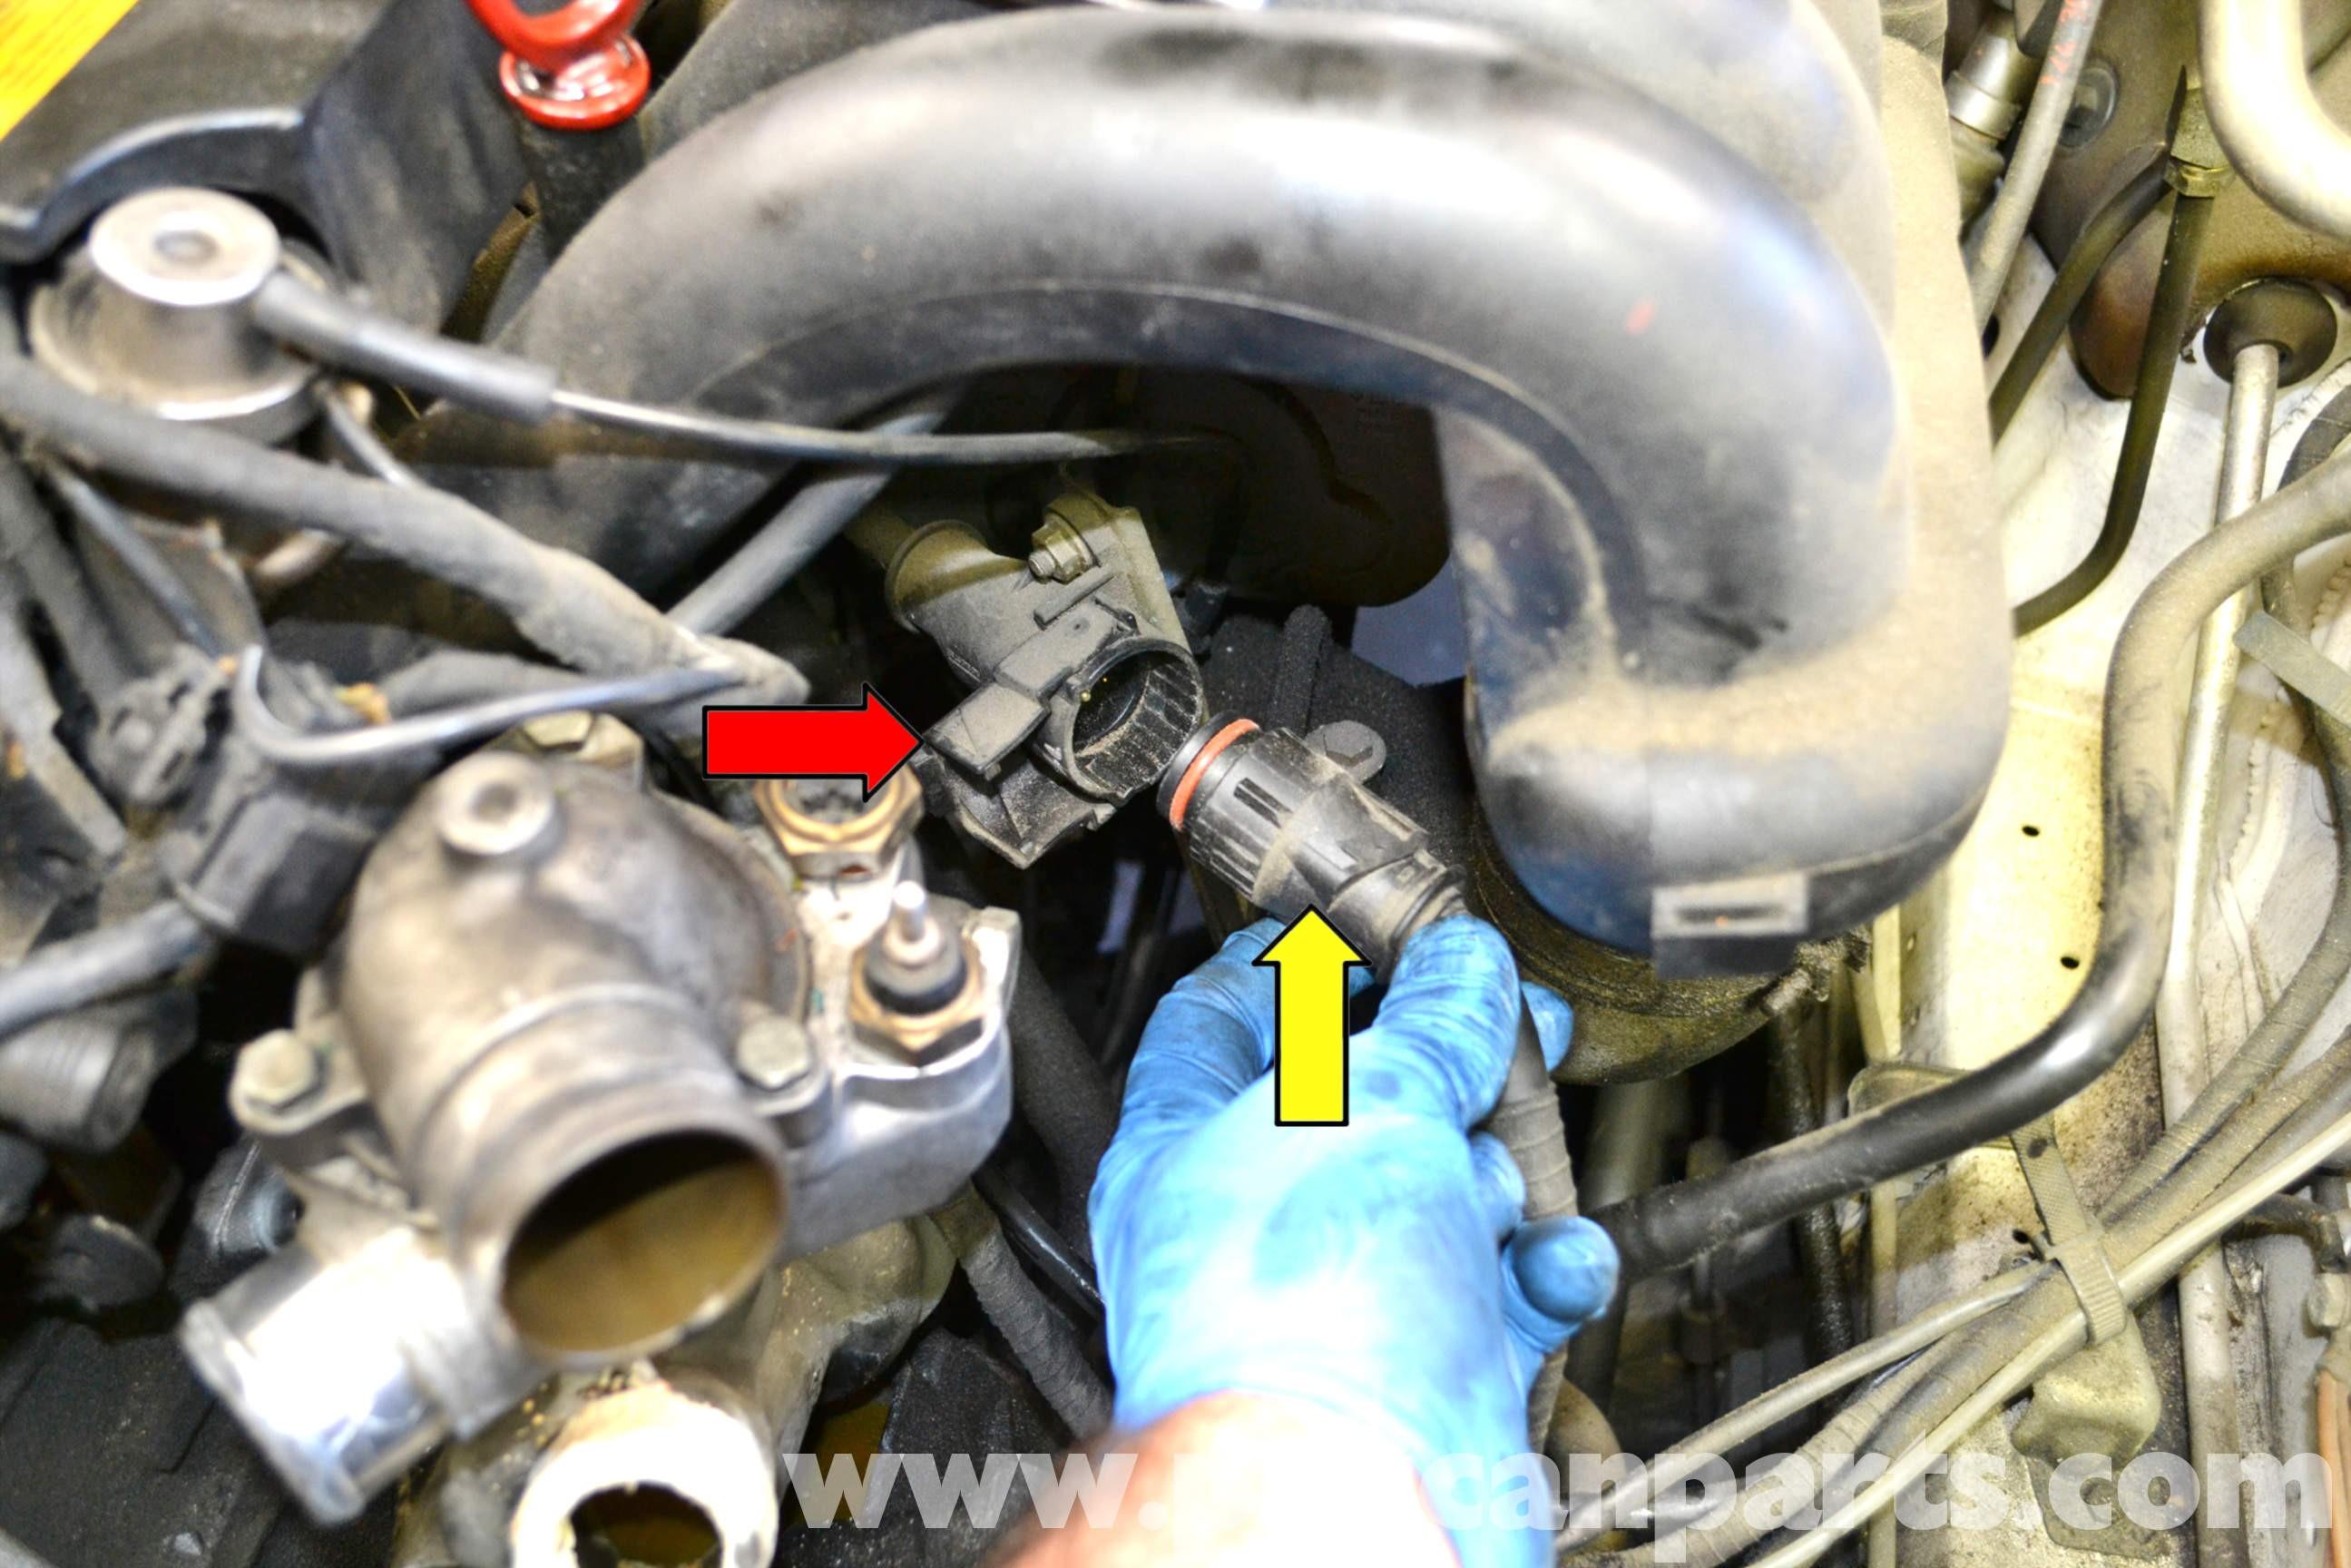 Diagram Of Car Water Pump Mercedes Benz W124 Water Pump Replacement Of Diagram Of Car Water Pump How to Change Engine Timing Belt Dodge Intrepid 3 5l 95 97 Part 2